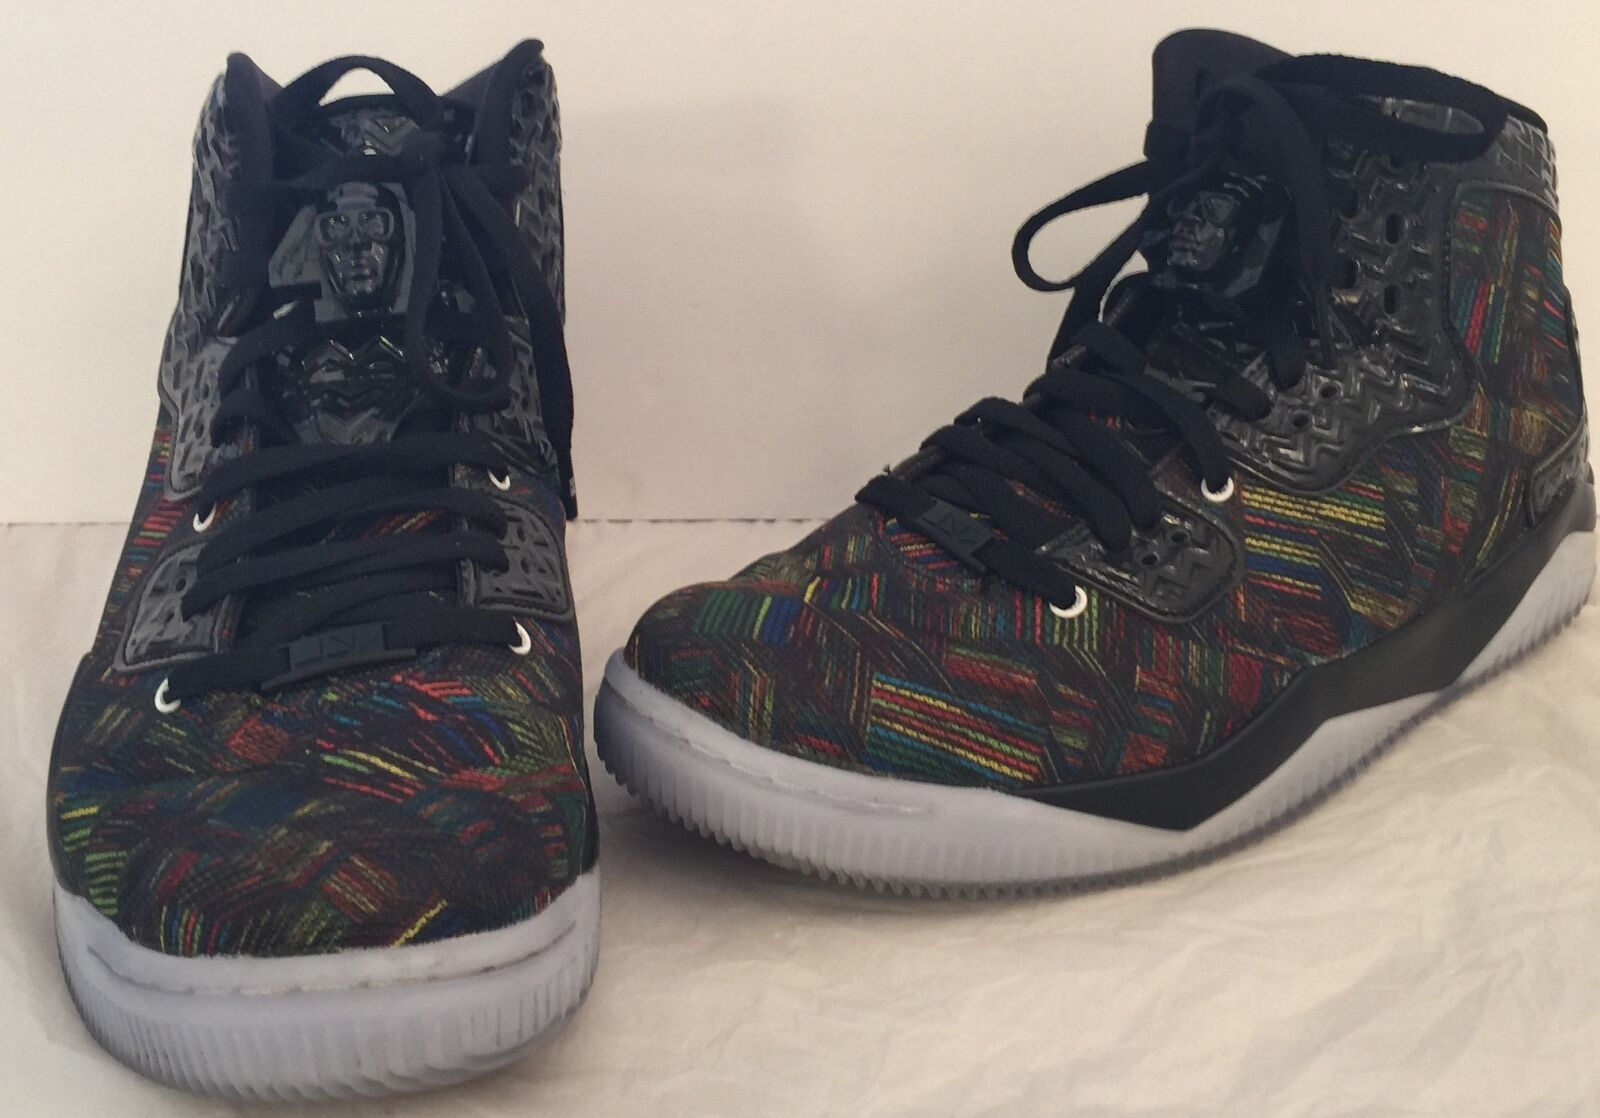 Nike Air Jordan Spike Forty BHM Sz 10.5 836750045 836750045 836750045 Black White Volt Green History bb6bf6